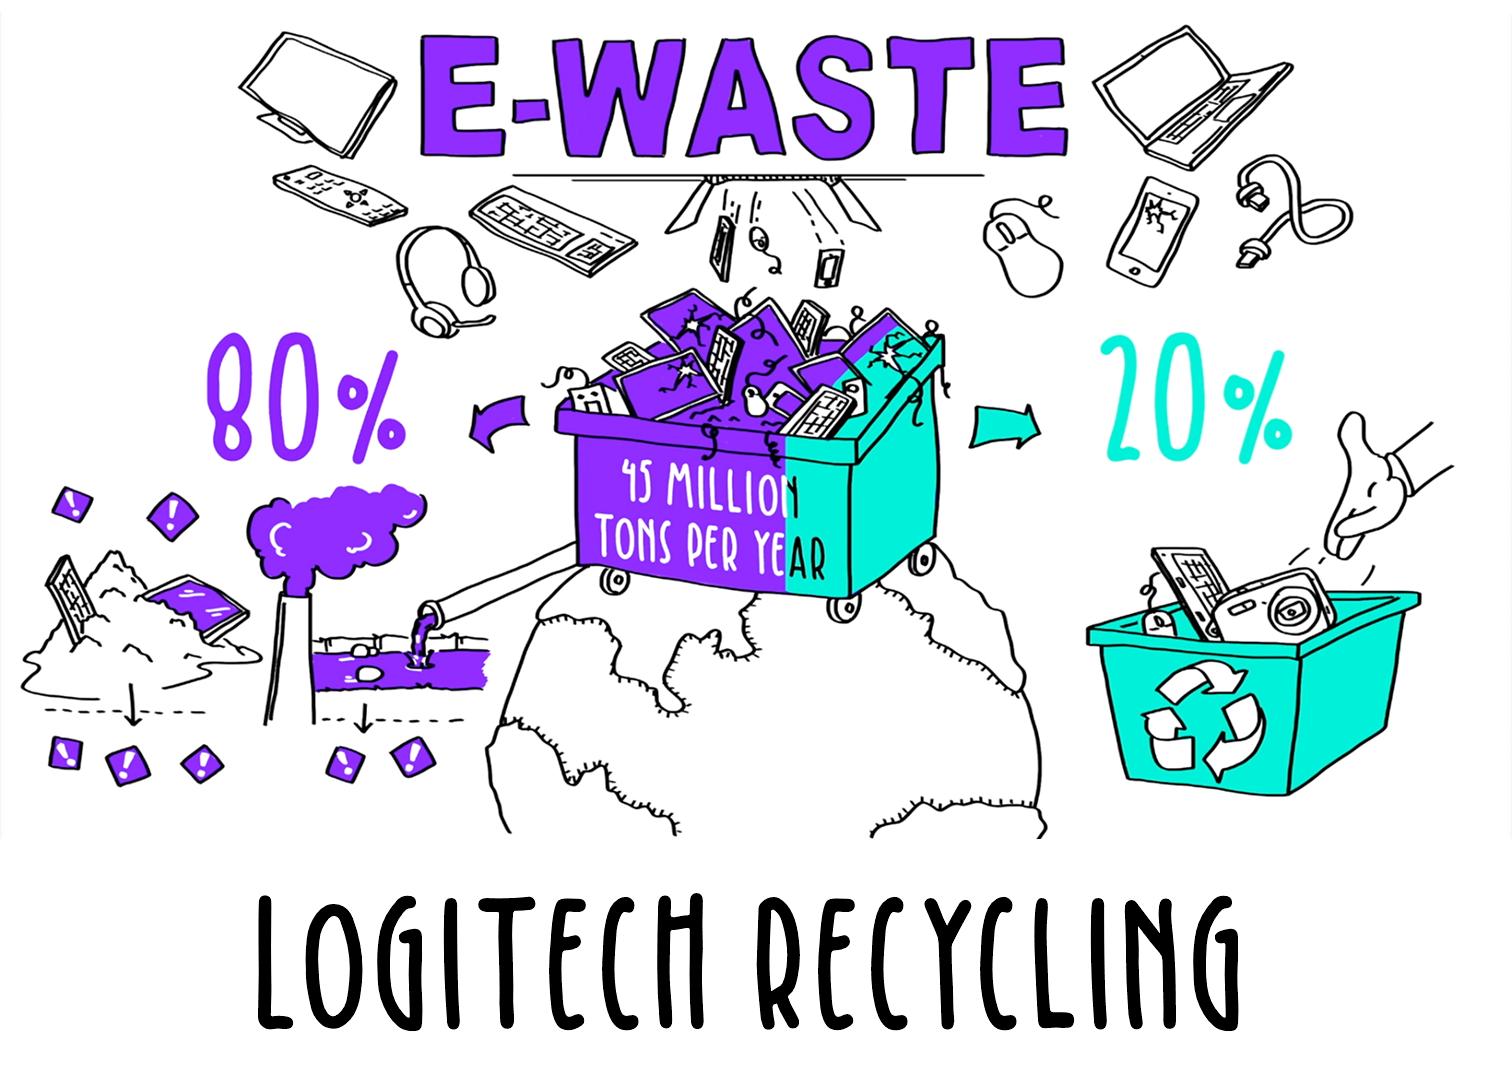 Logitech: electronic waste recycling